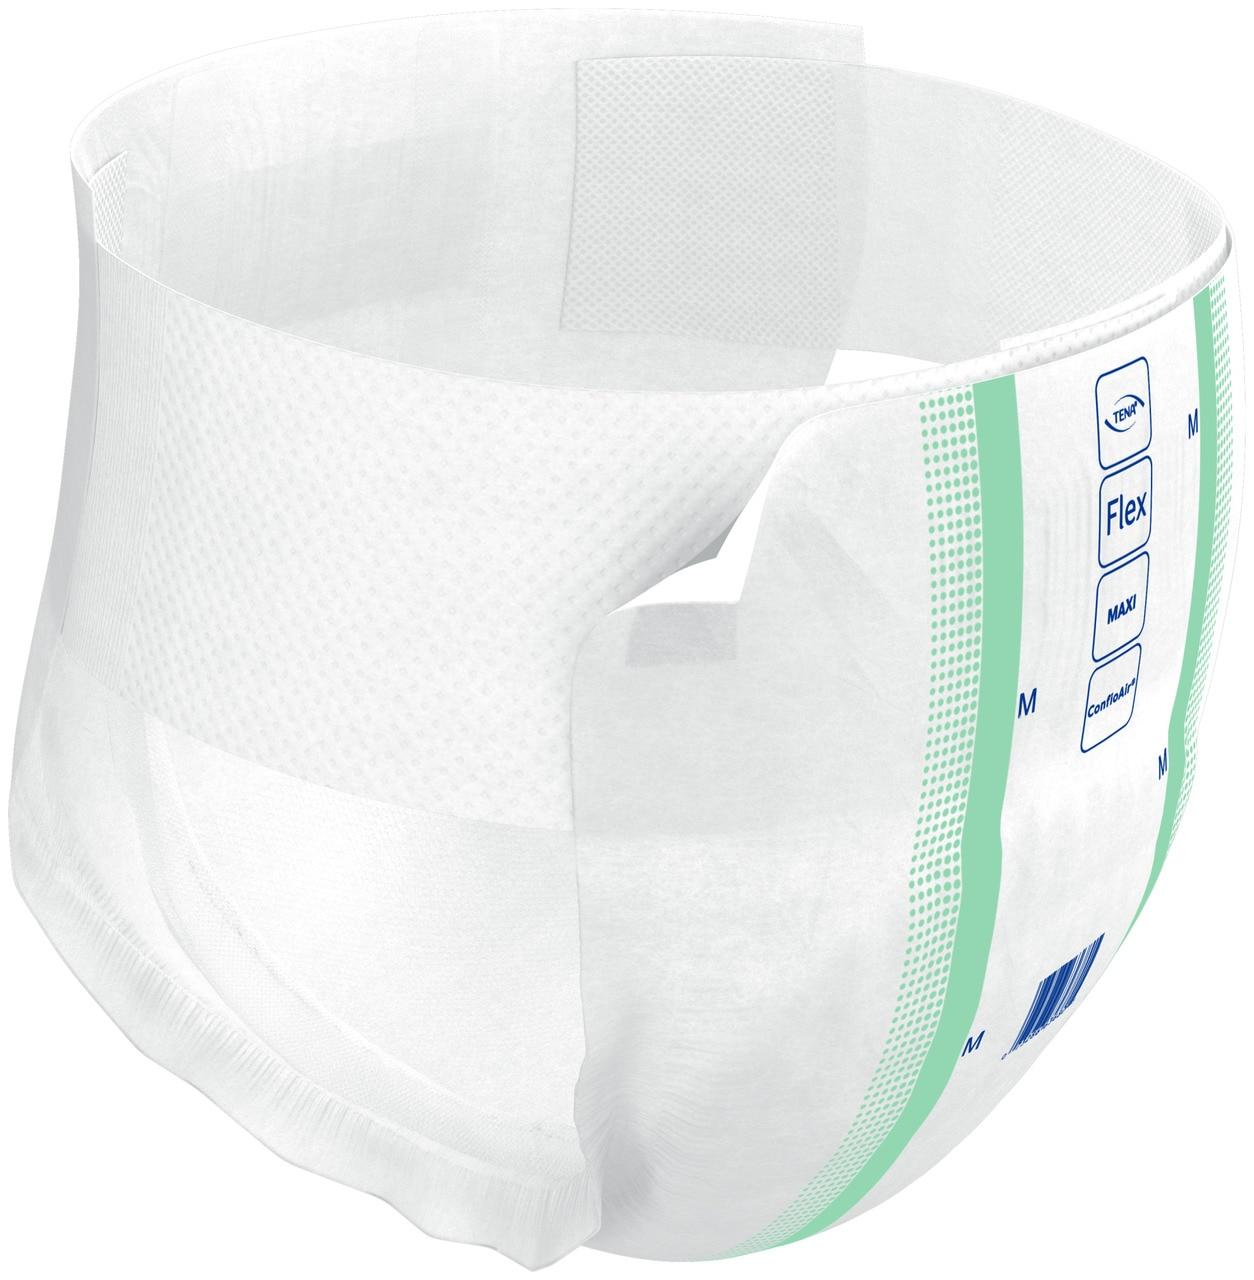 TENA ProSkin Flex Maxi Adult Diapers, Maximum Absorbency